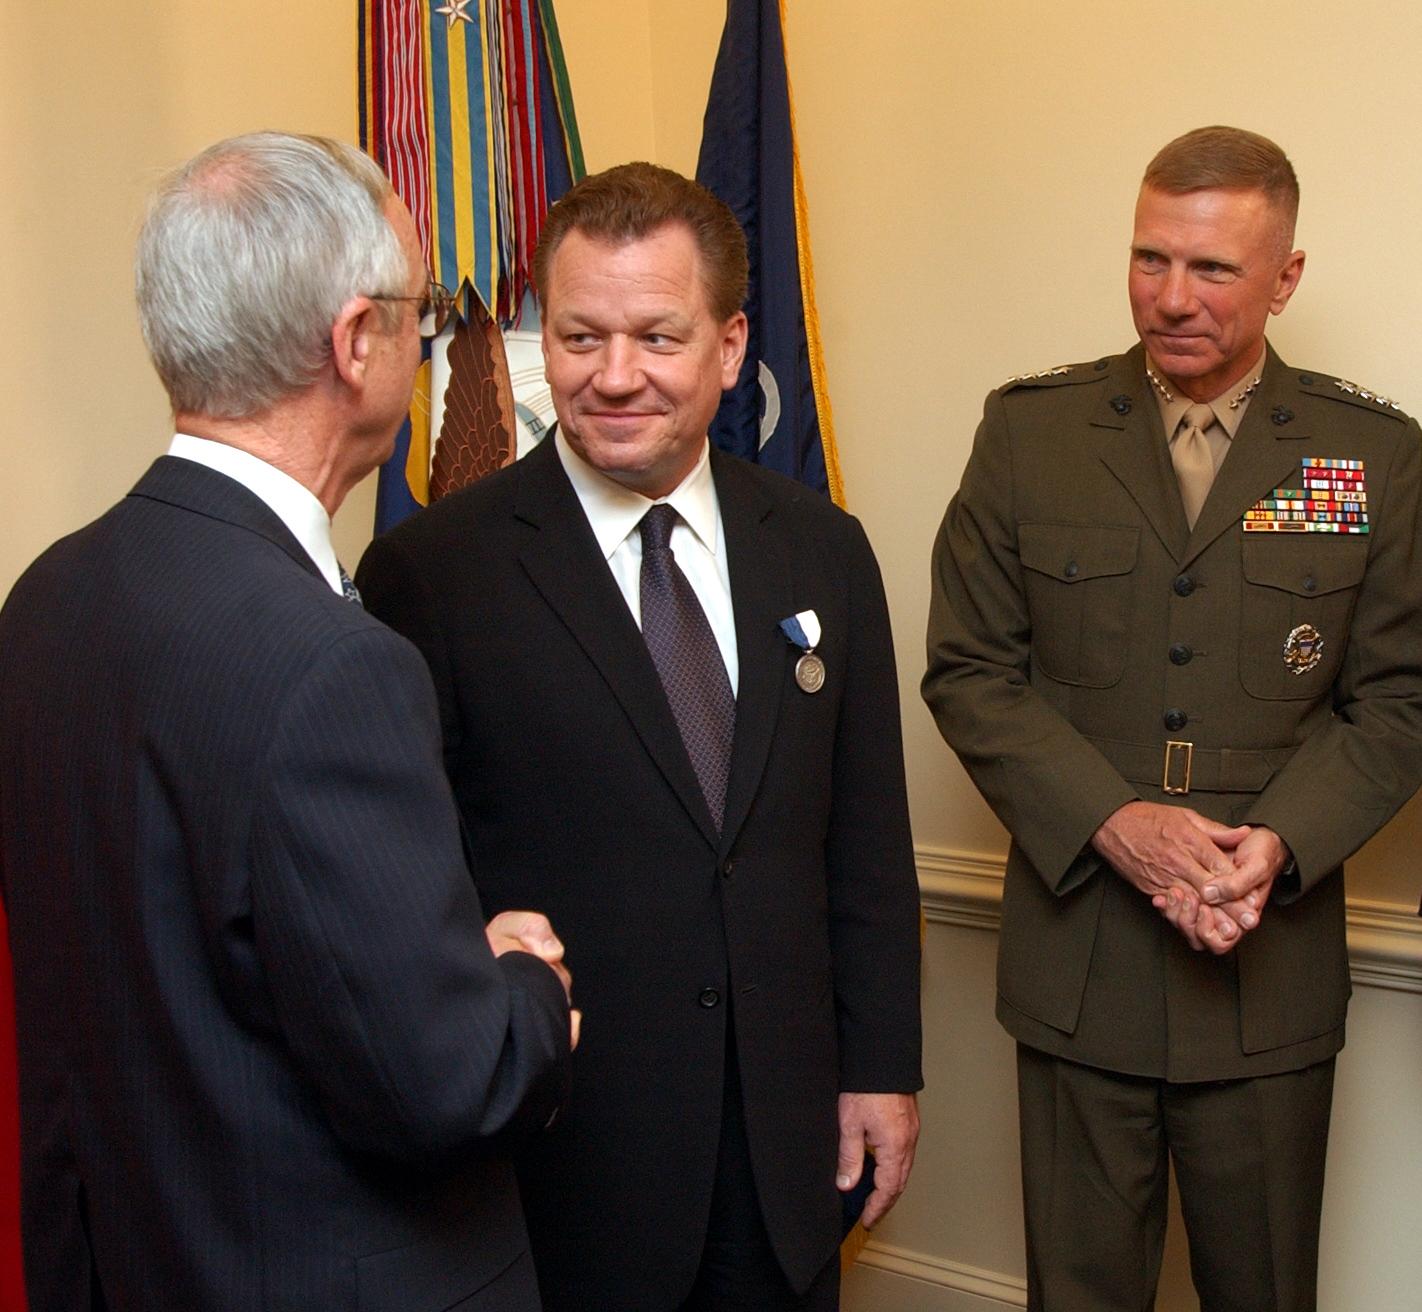 Secretary of the Navy [[Gordon R. England